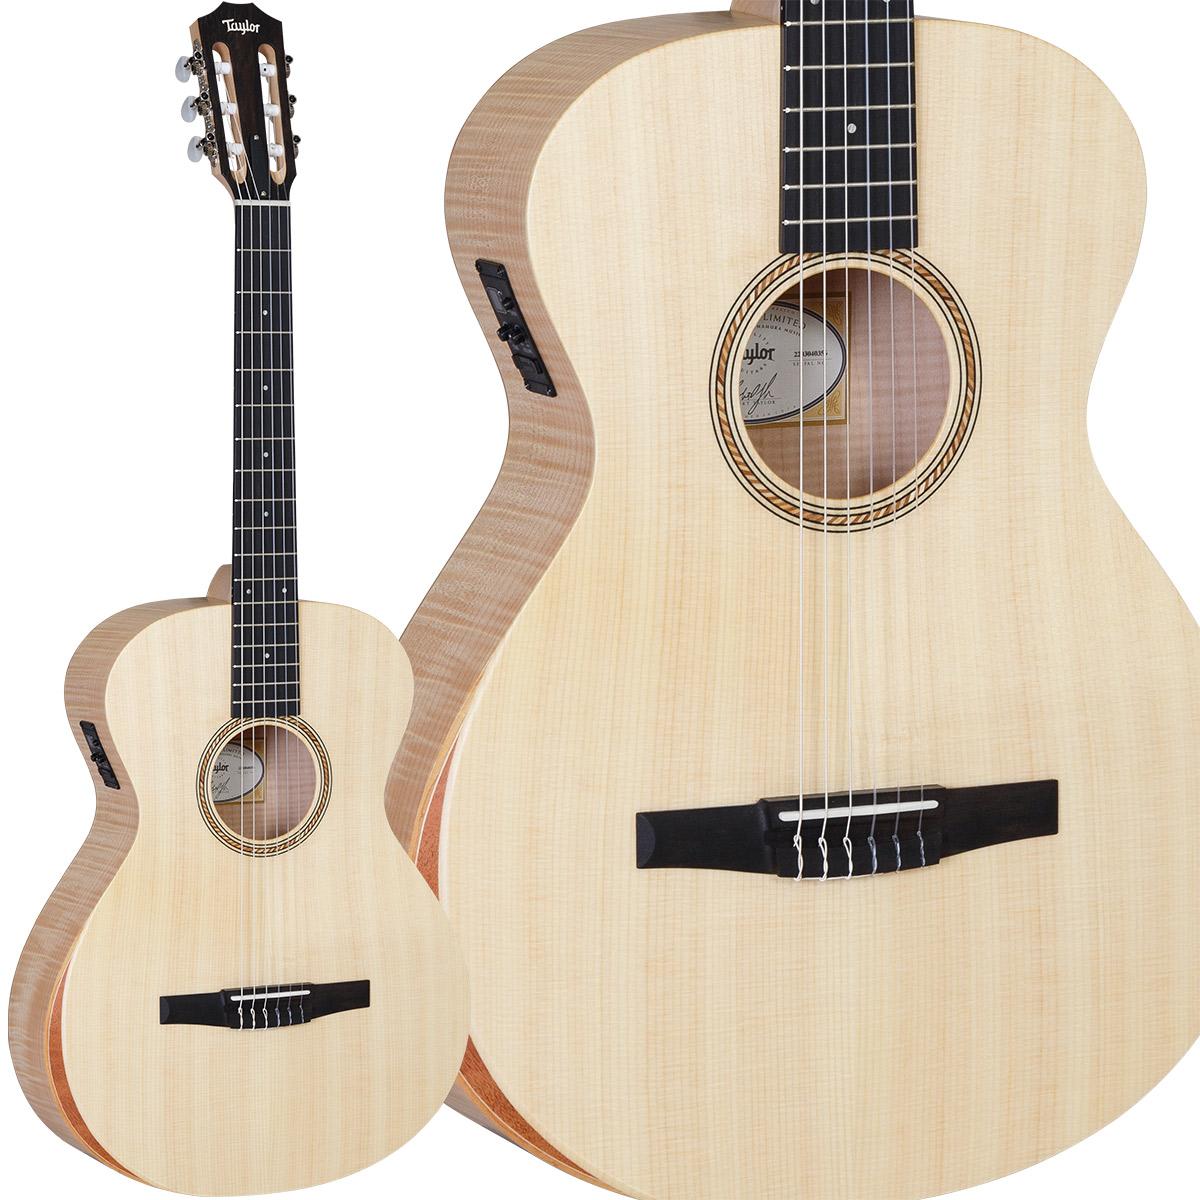 Taylor LTD EG Academy 12e-N エレガットギター 【テイラー】【島村楽器オリジナルモデル】